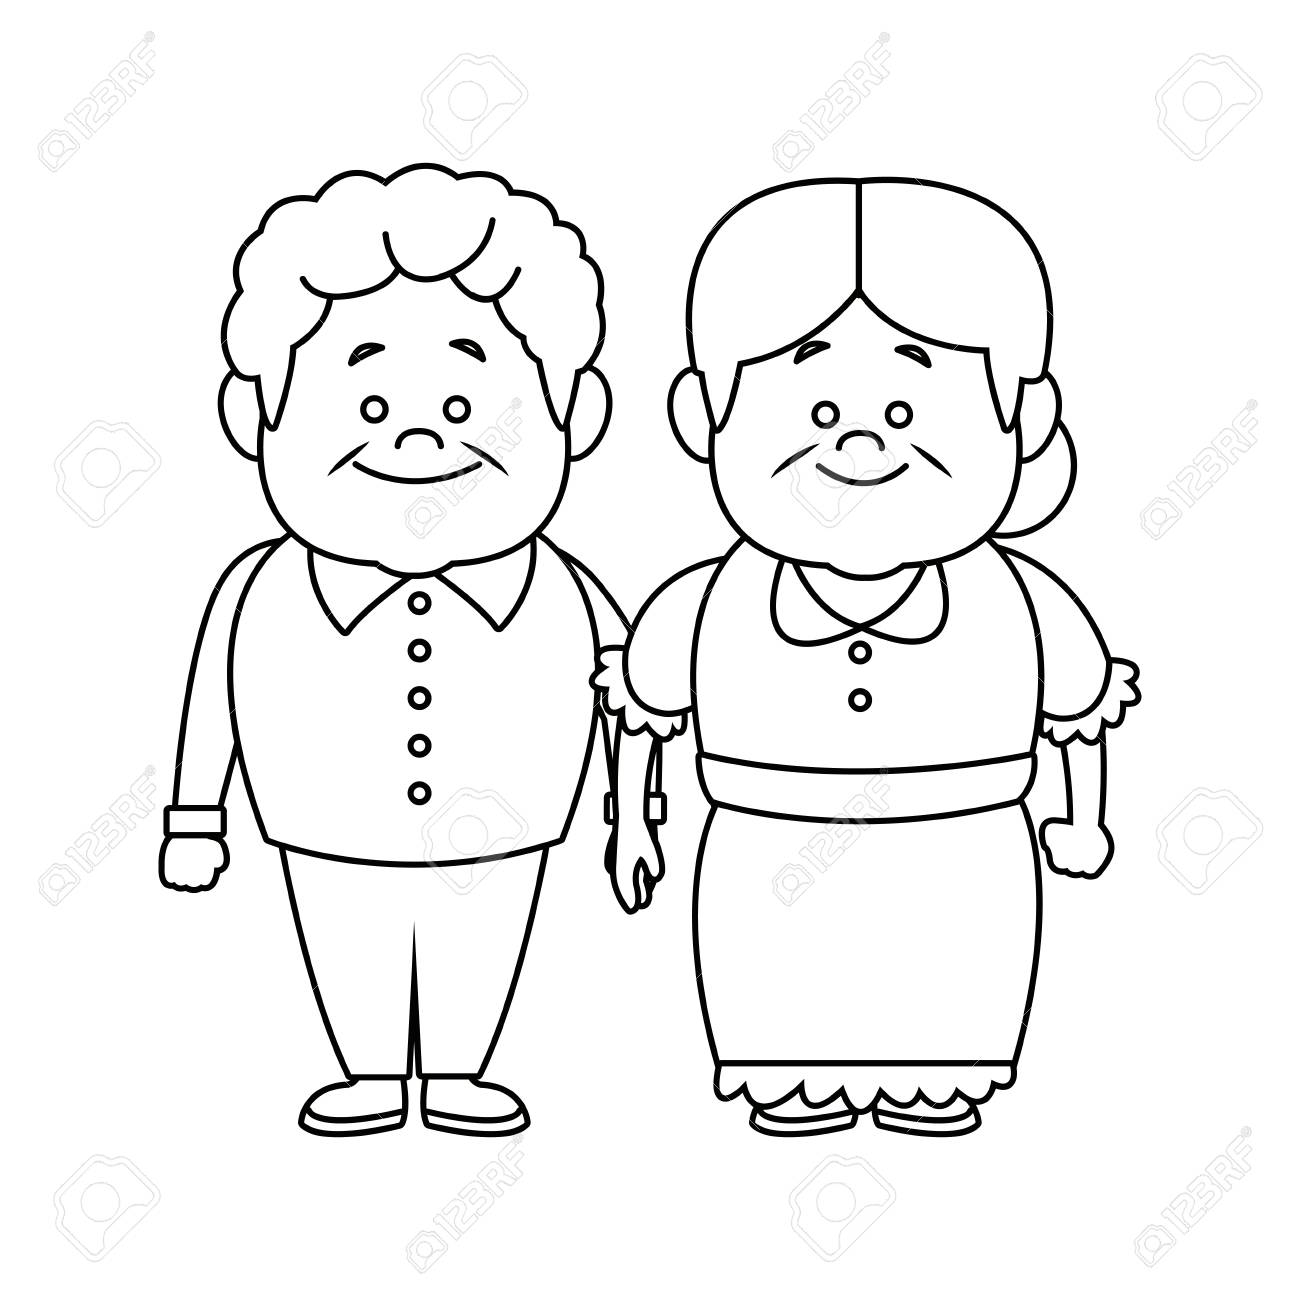 happy grandpa and grandma parents standing together vecto illustration.